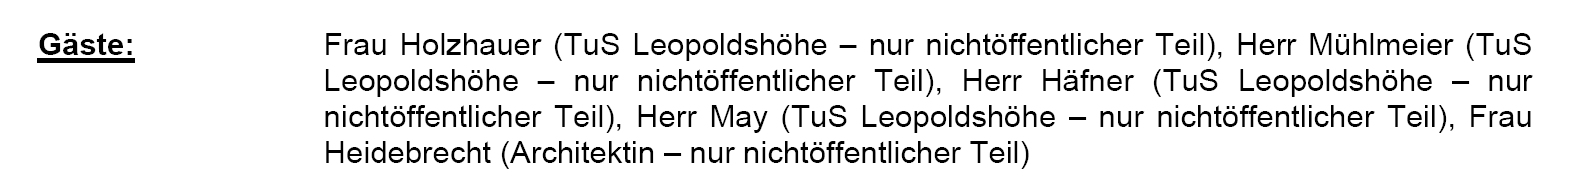 2006_protokoll_ajks_auszug_2